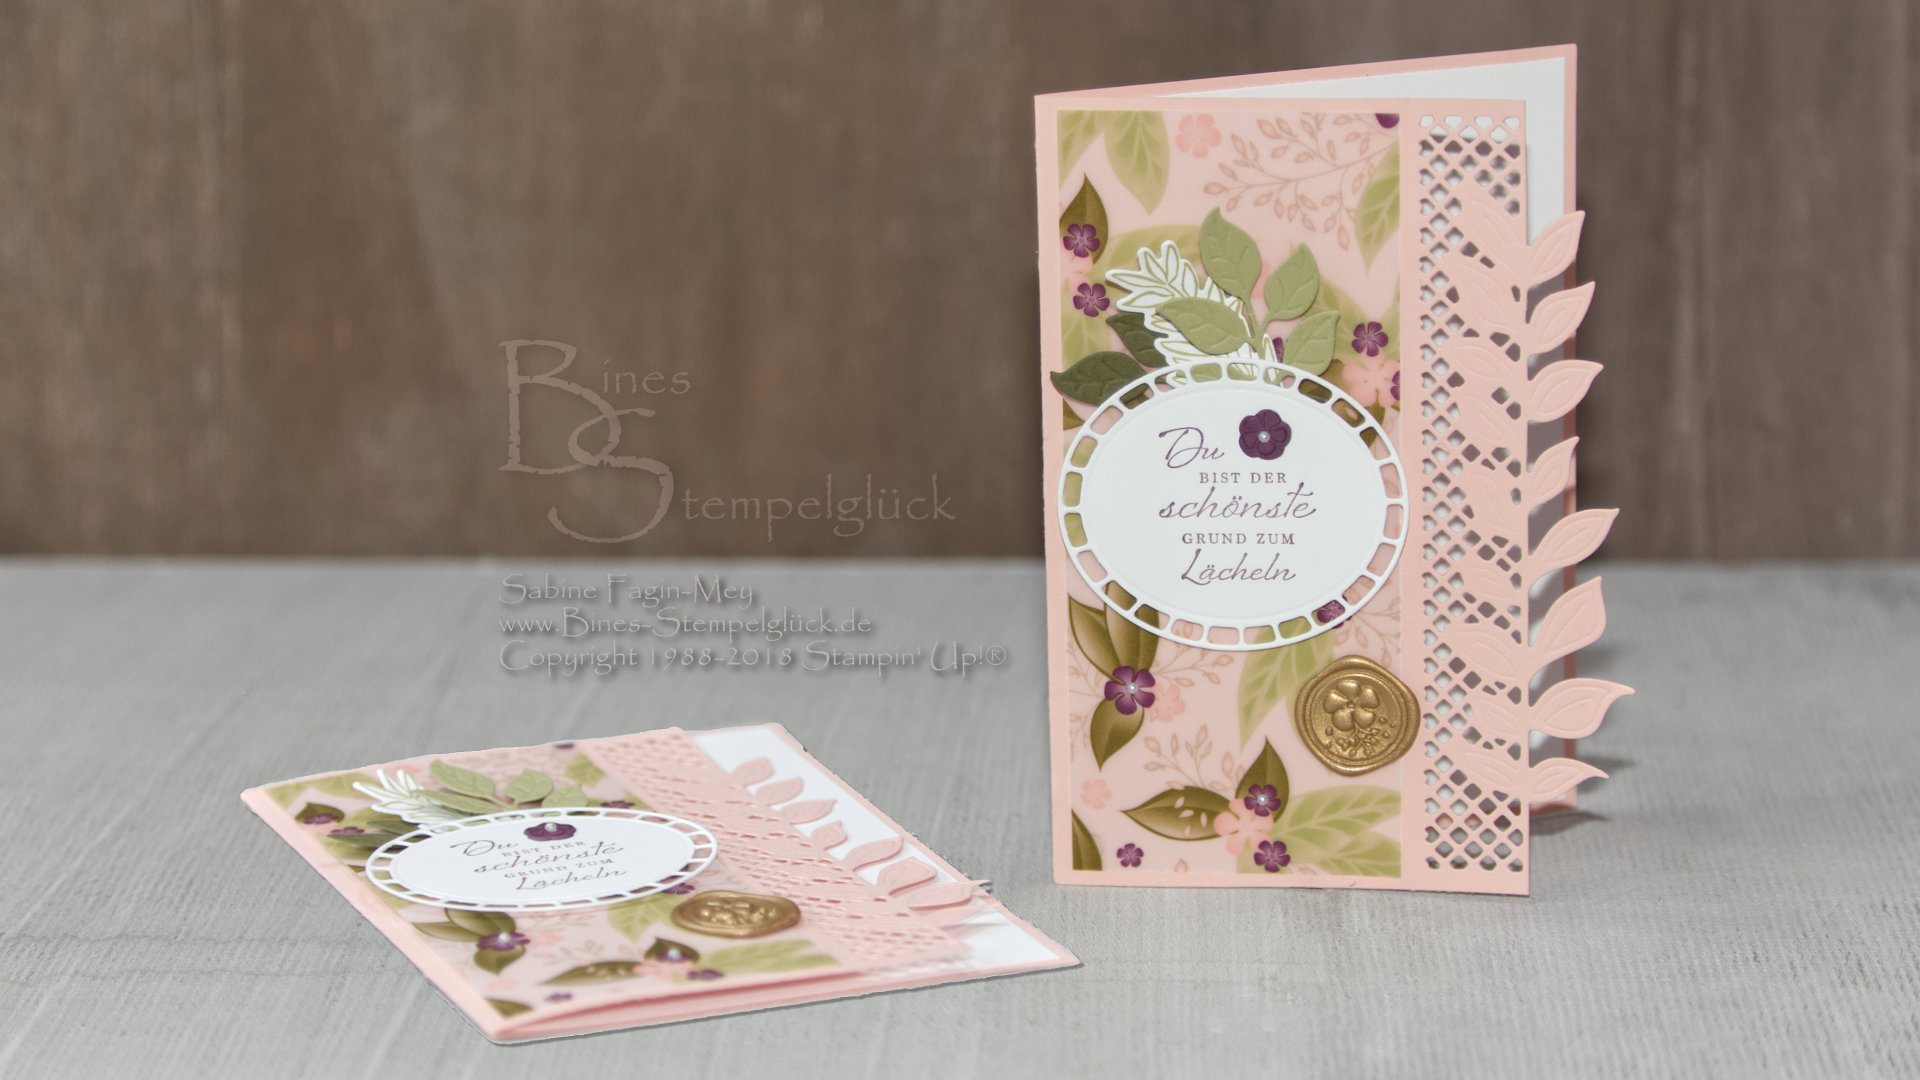 Zauberhafte Karte Blütensinfonie Mit Stampin Up Bines Stempelglück